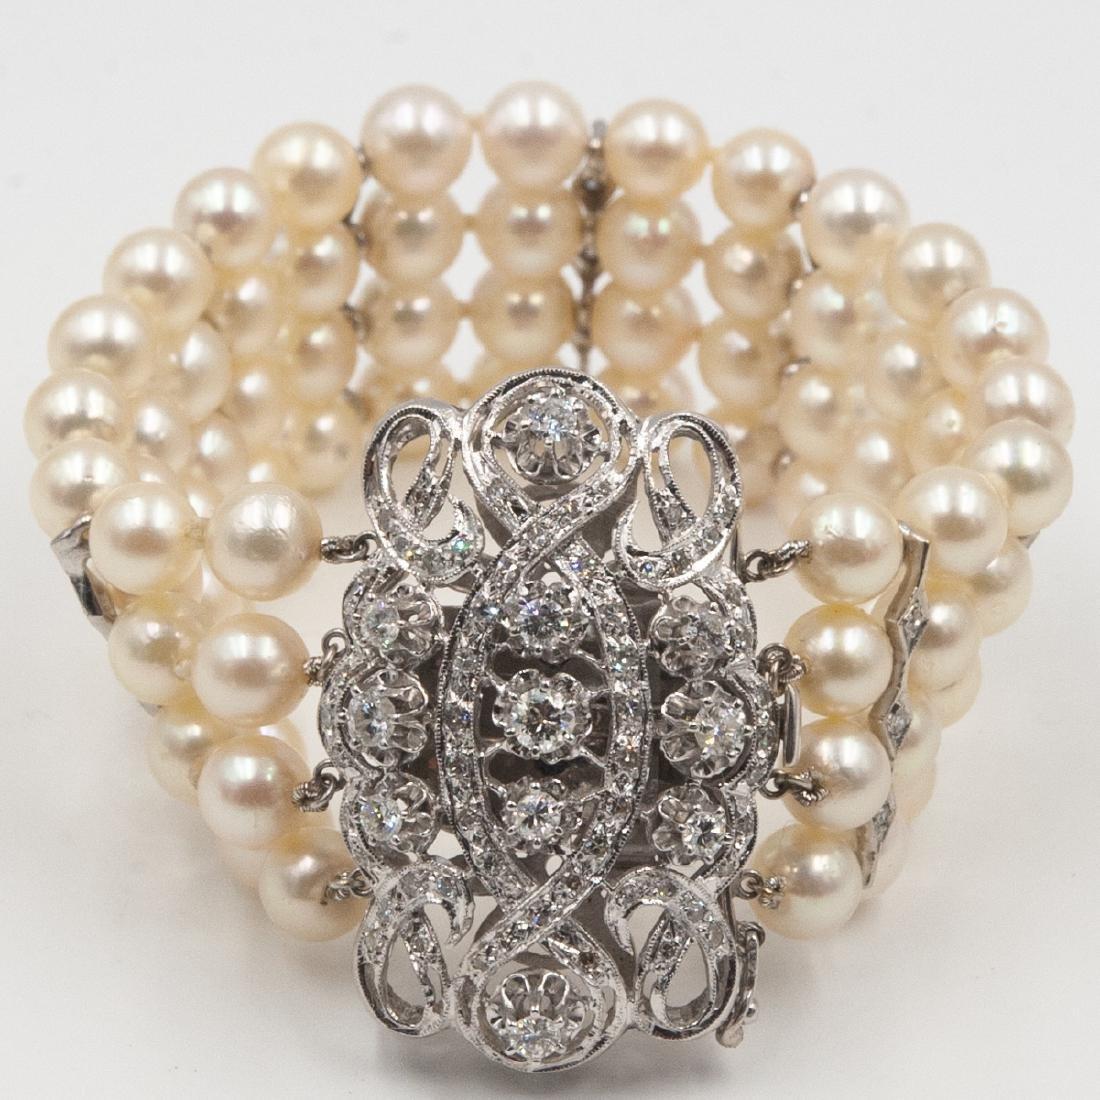 14k Gold, Diamond and Pearl Bracelet